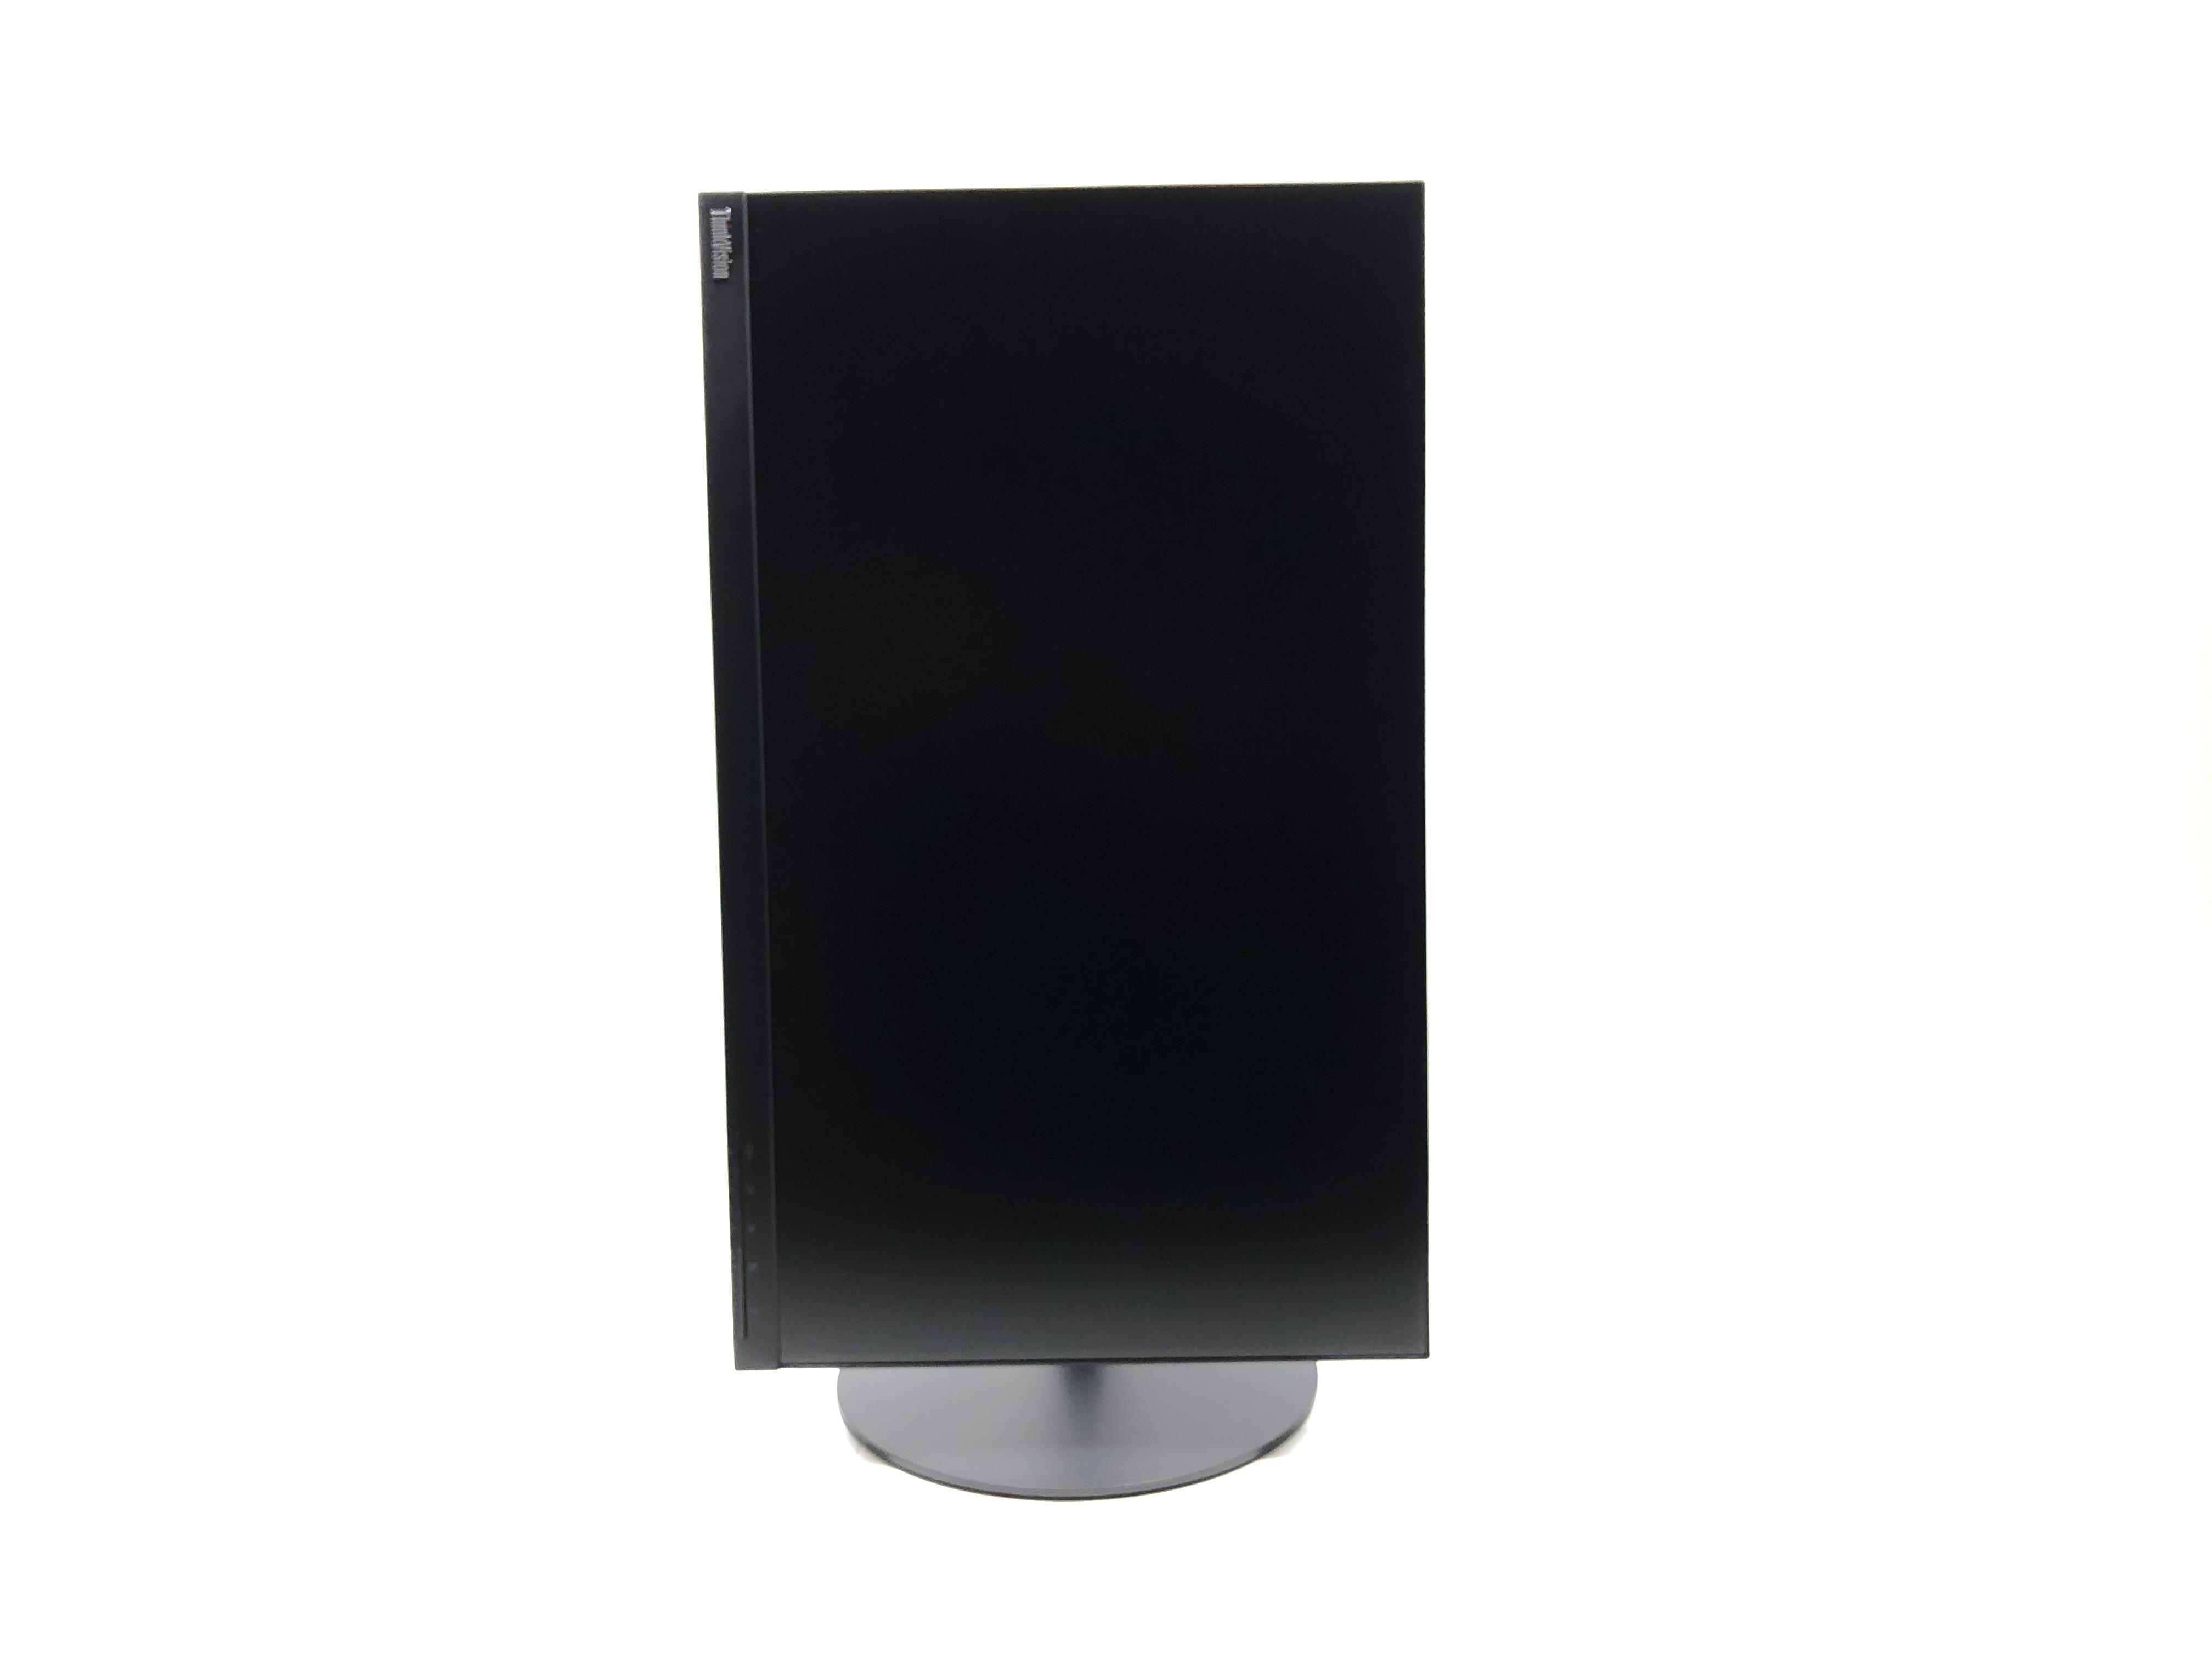 Lenovo ThinkVision T24i-10 No 3